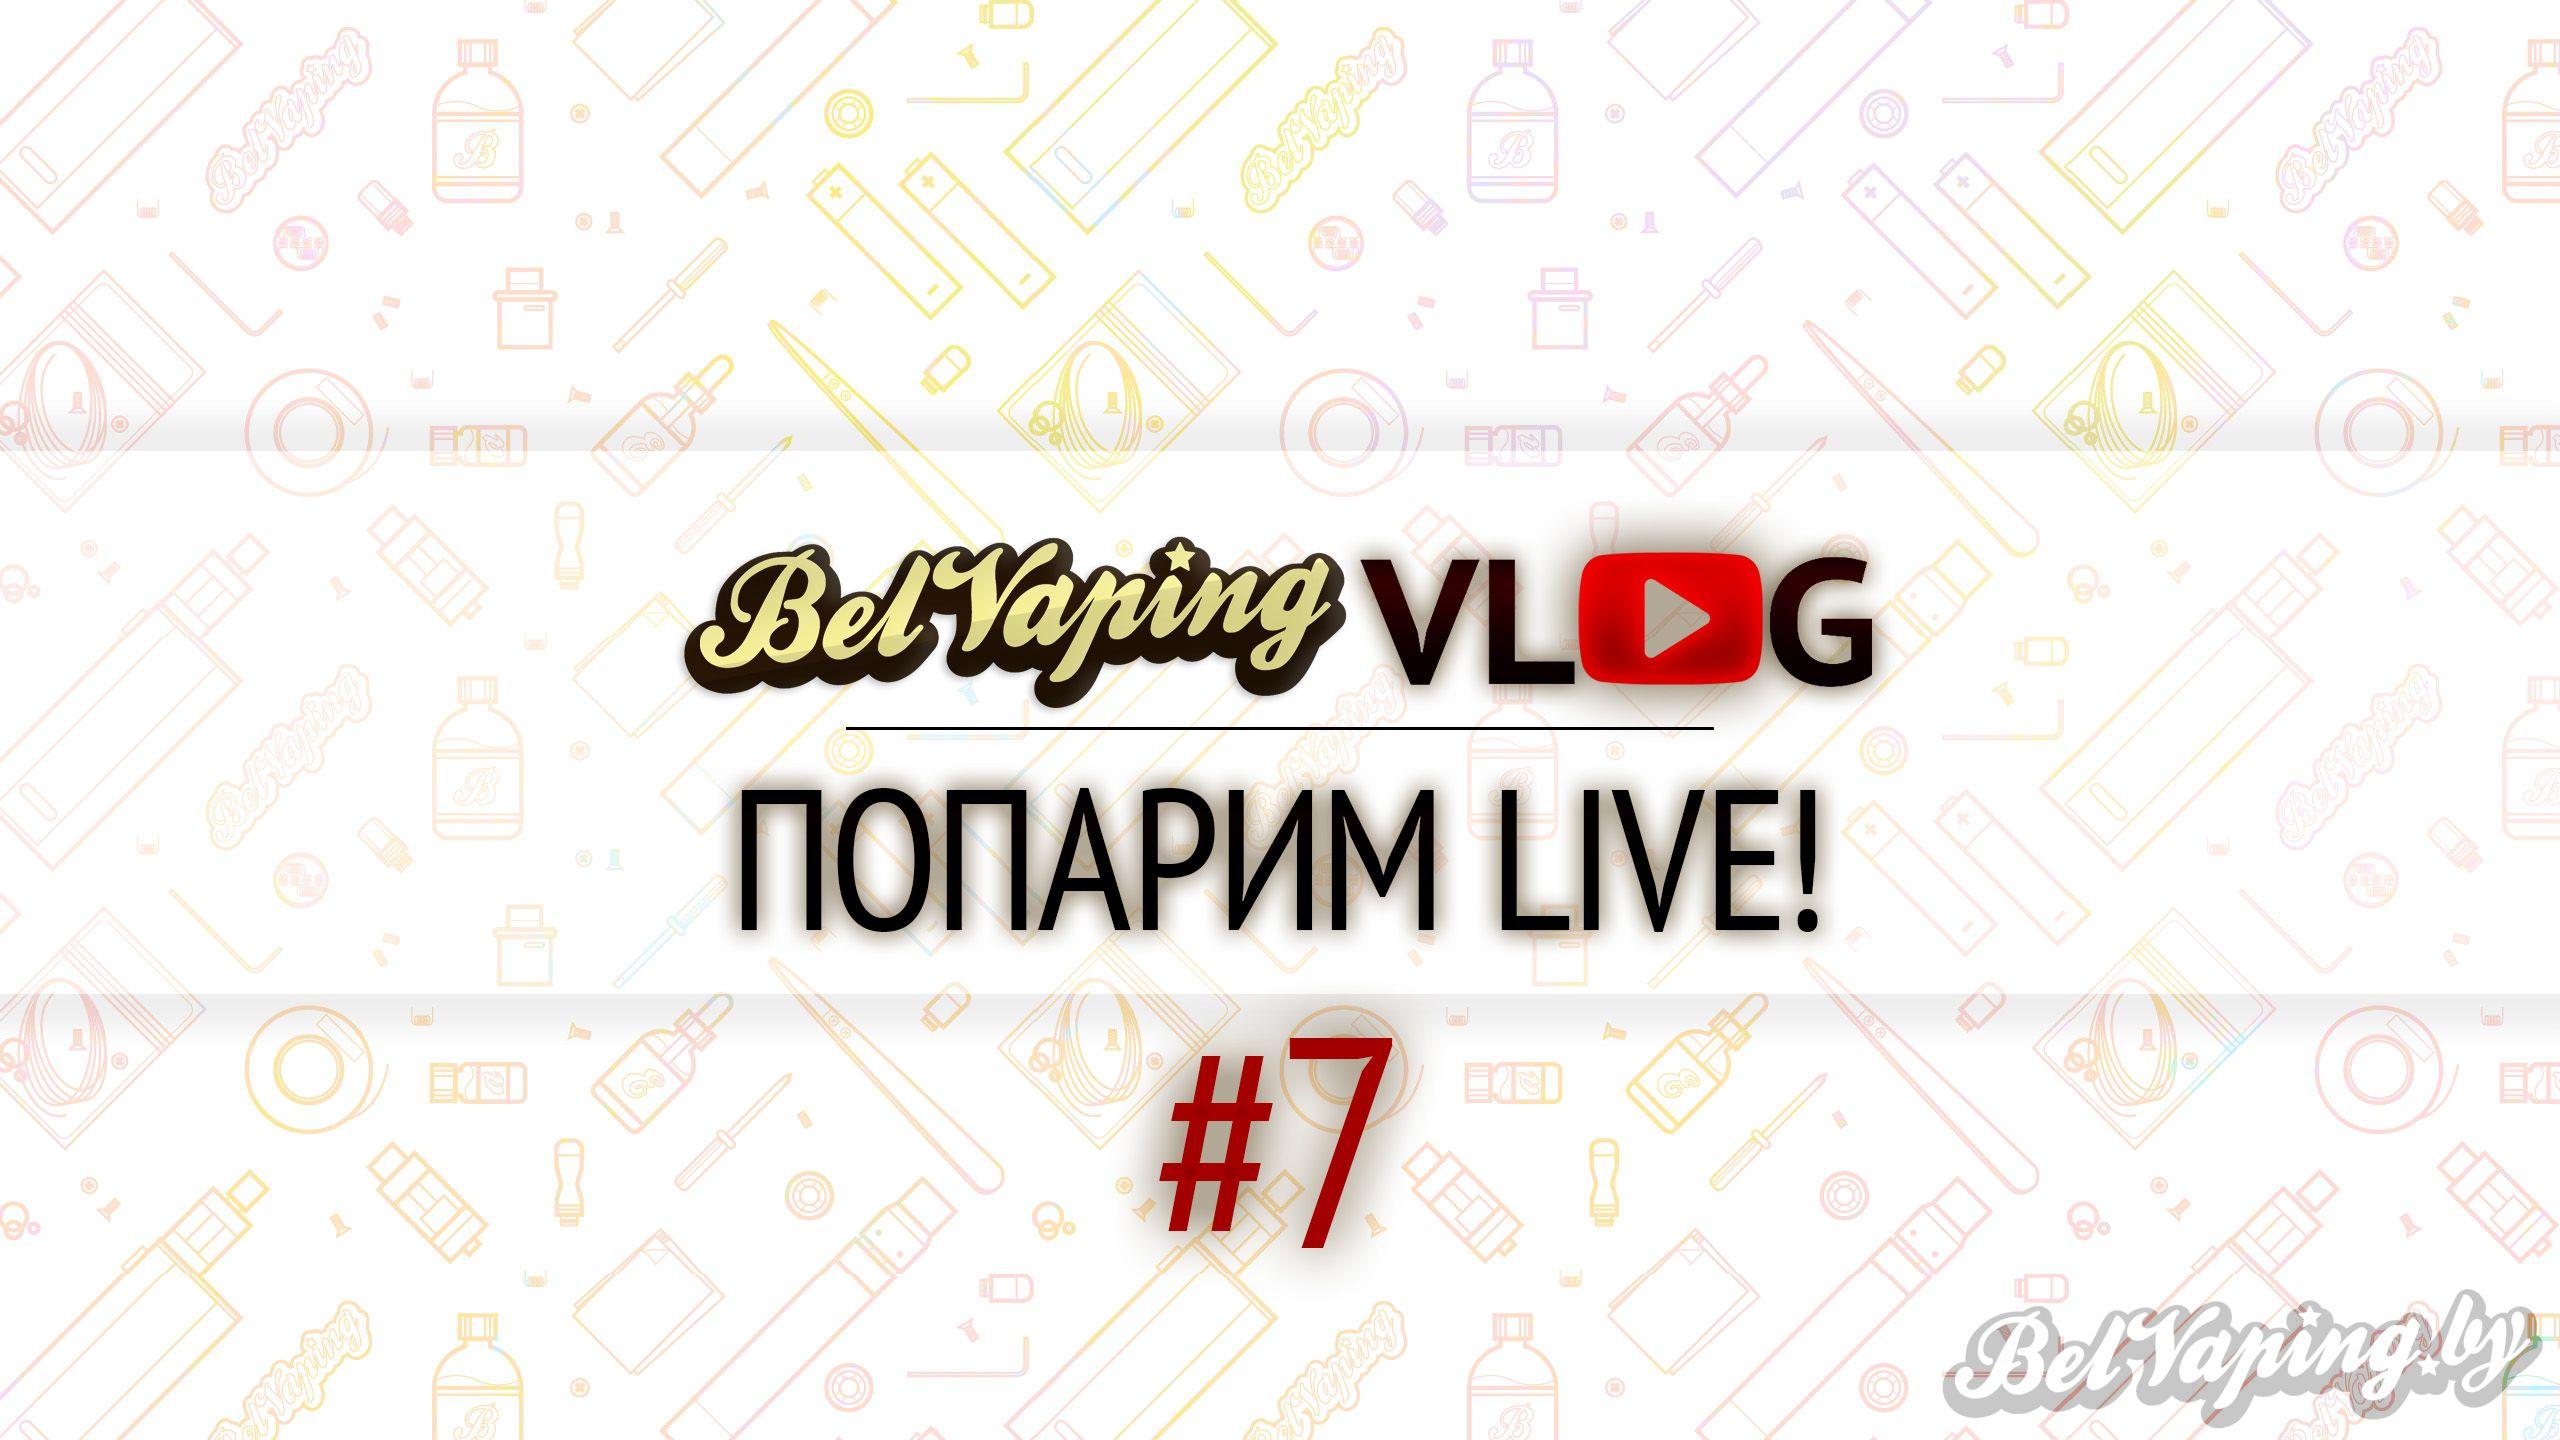 BelVapingVlog #7: Попарим Live!